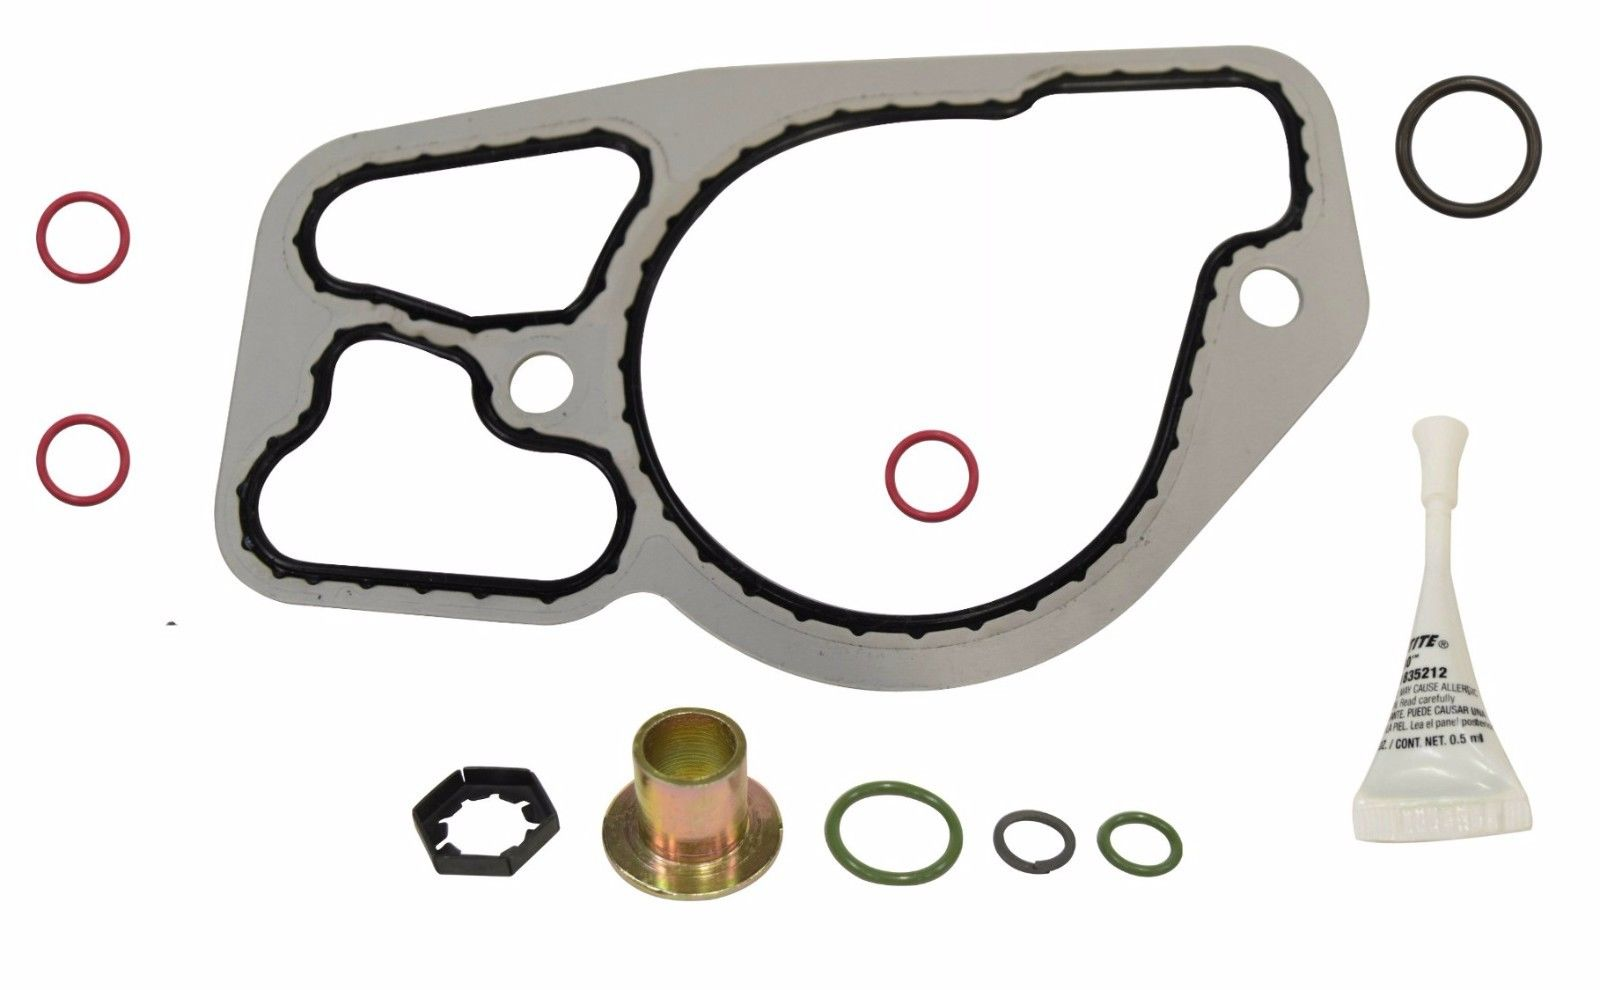 High Pressure Oil Pump HPOP Base Gasket Oring Kit For Ford 7.3 Powerstroke 94-03